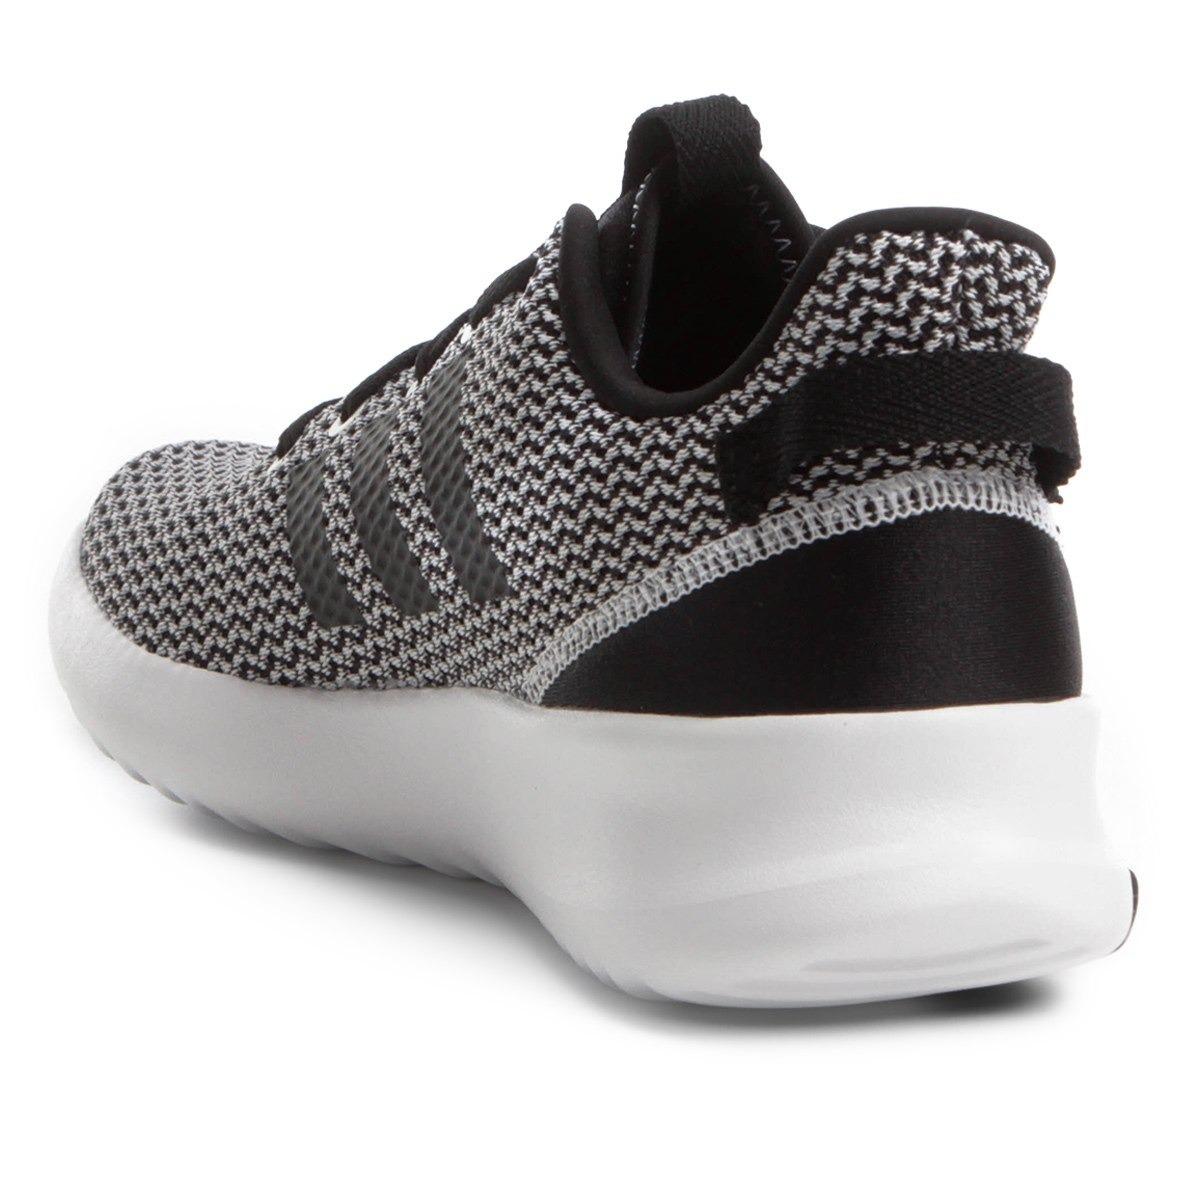 tênis adidas cf racer tr preto e branco masculino- da9305-45. Carregando  zoom. ea8c416368815